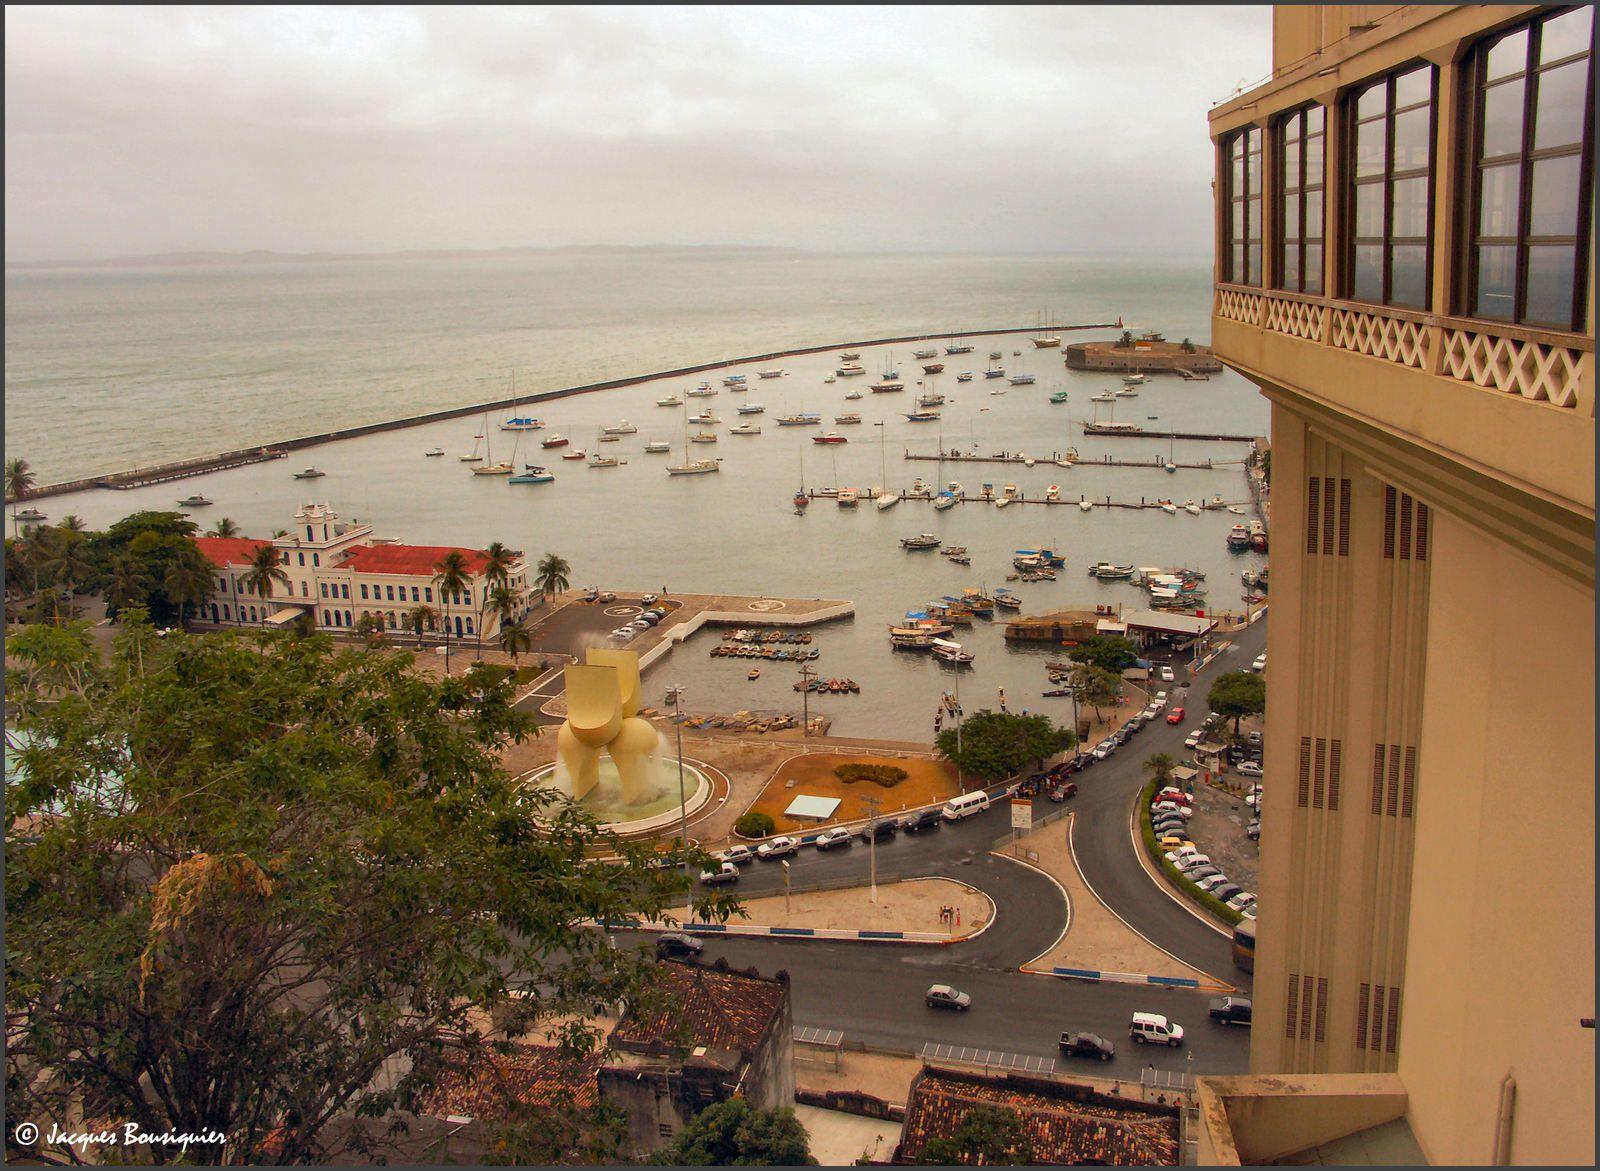 En direct de... Salvador de Bahia